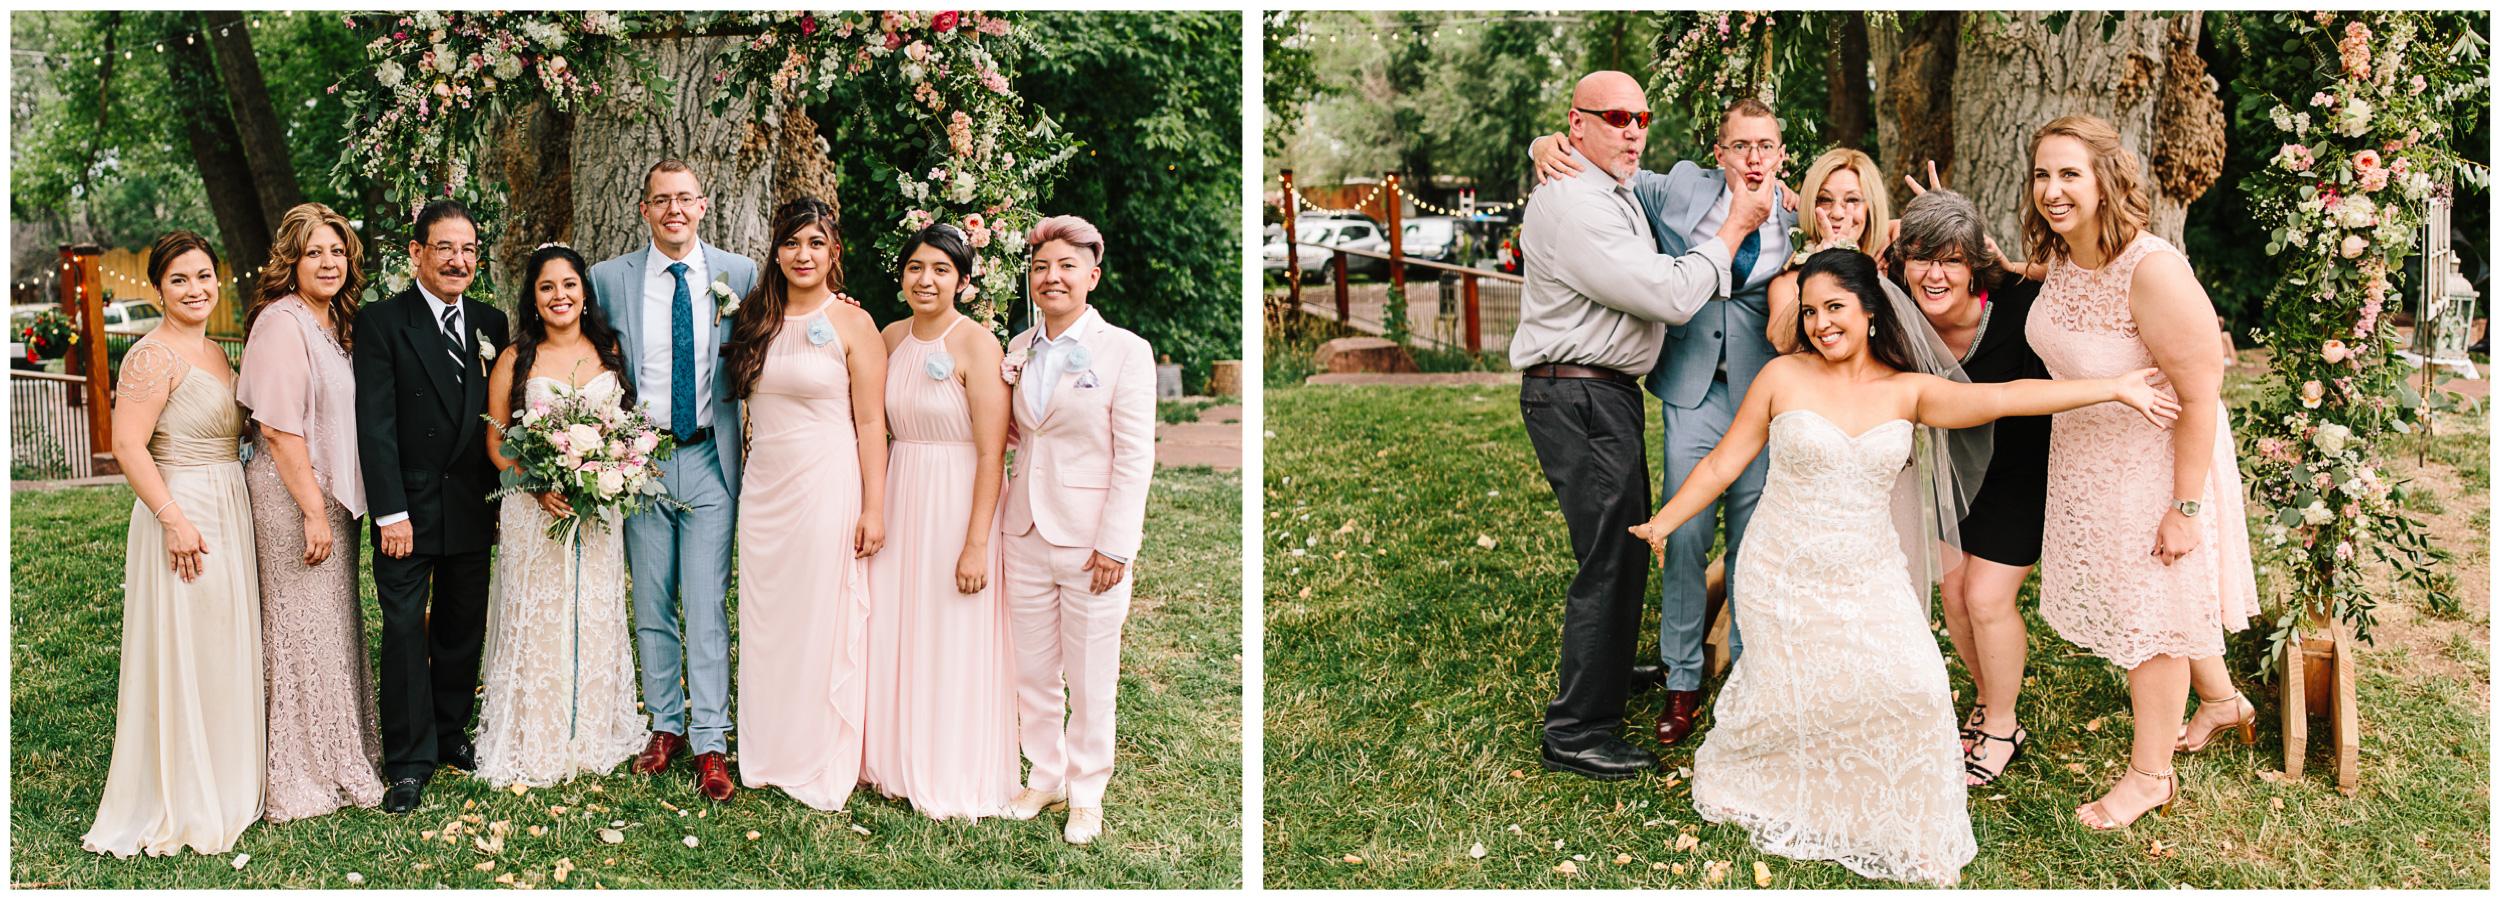 lyons_farmette_wedding_32.jpg